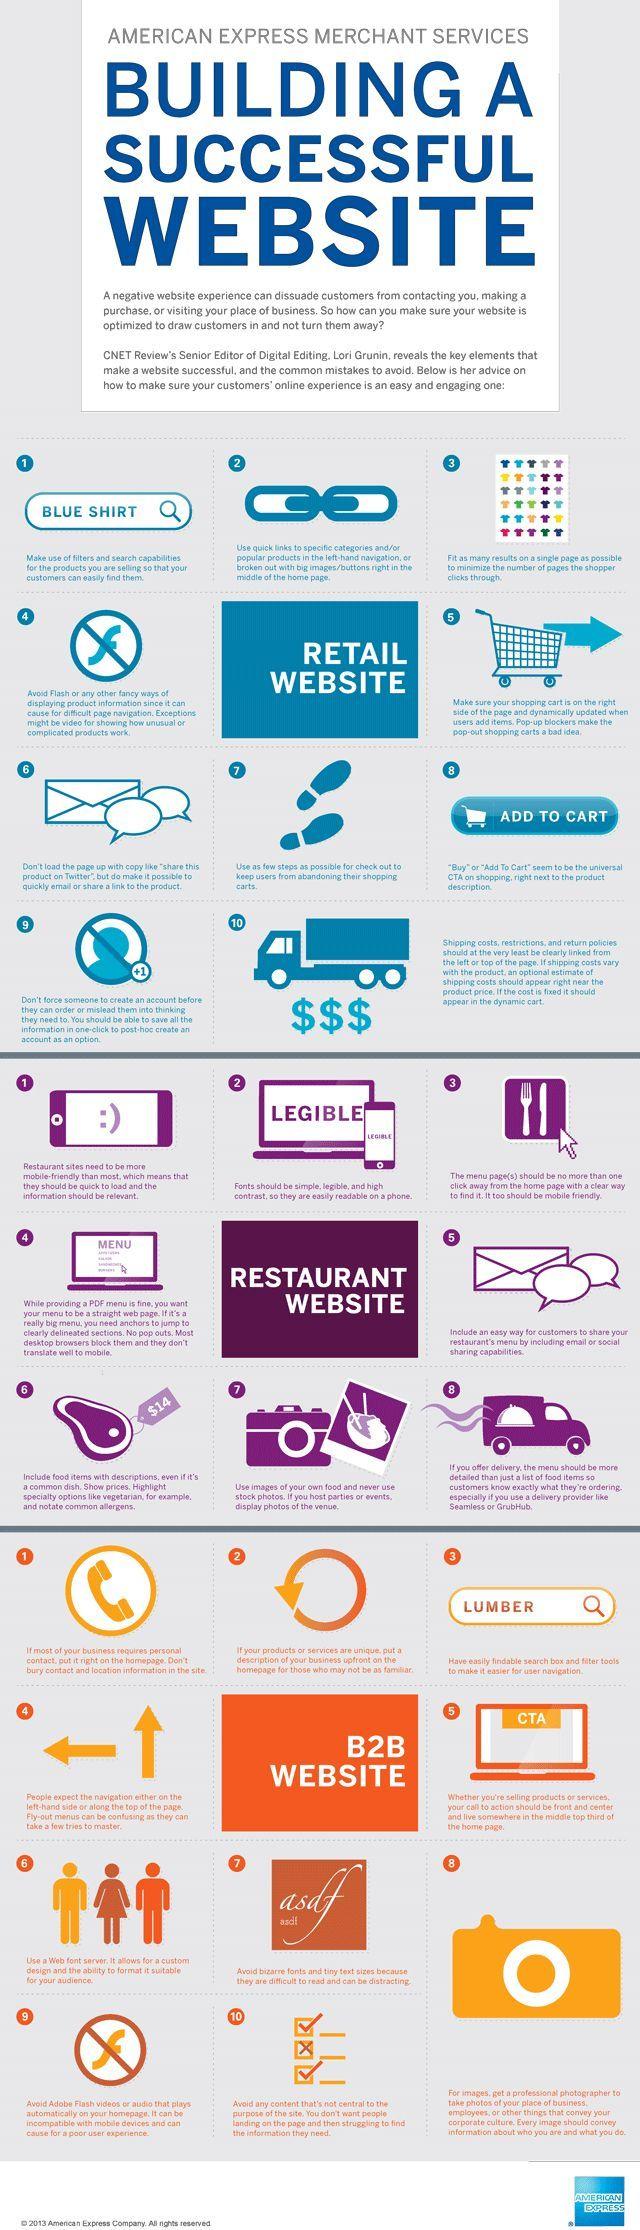 26 Tips for a More Successful Business Website   web design inspiration   digital media arts college   www.dmac.edu   561.391.1148